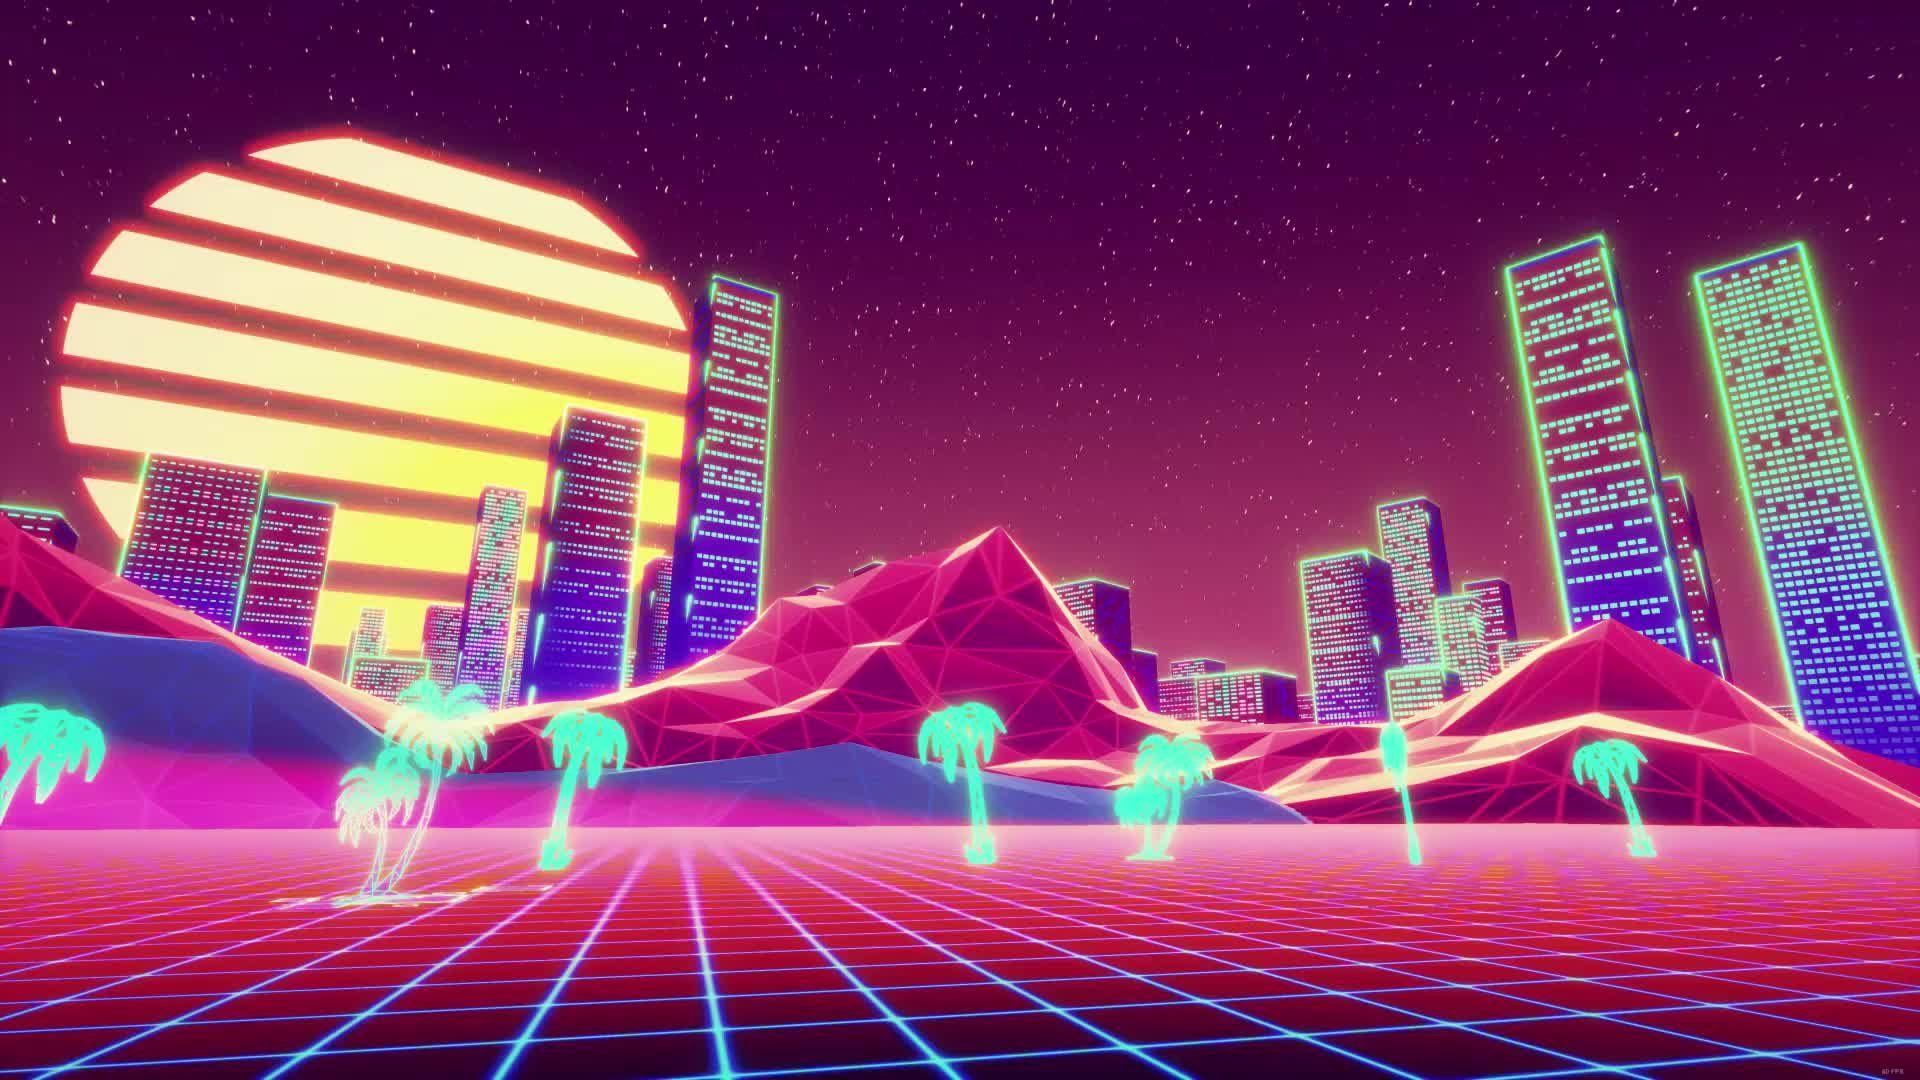 2K Retro City Neon Lights Live ...